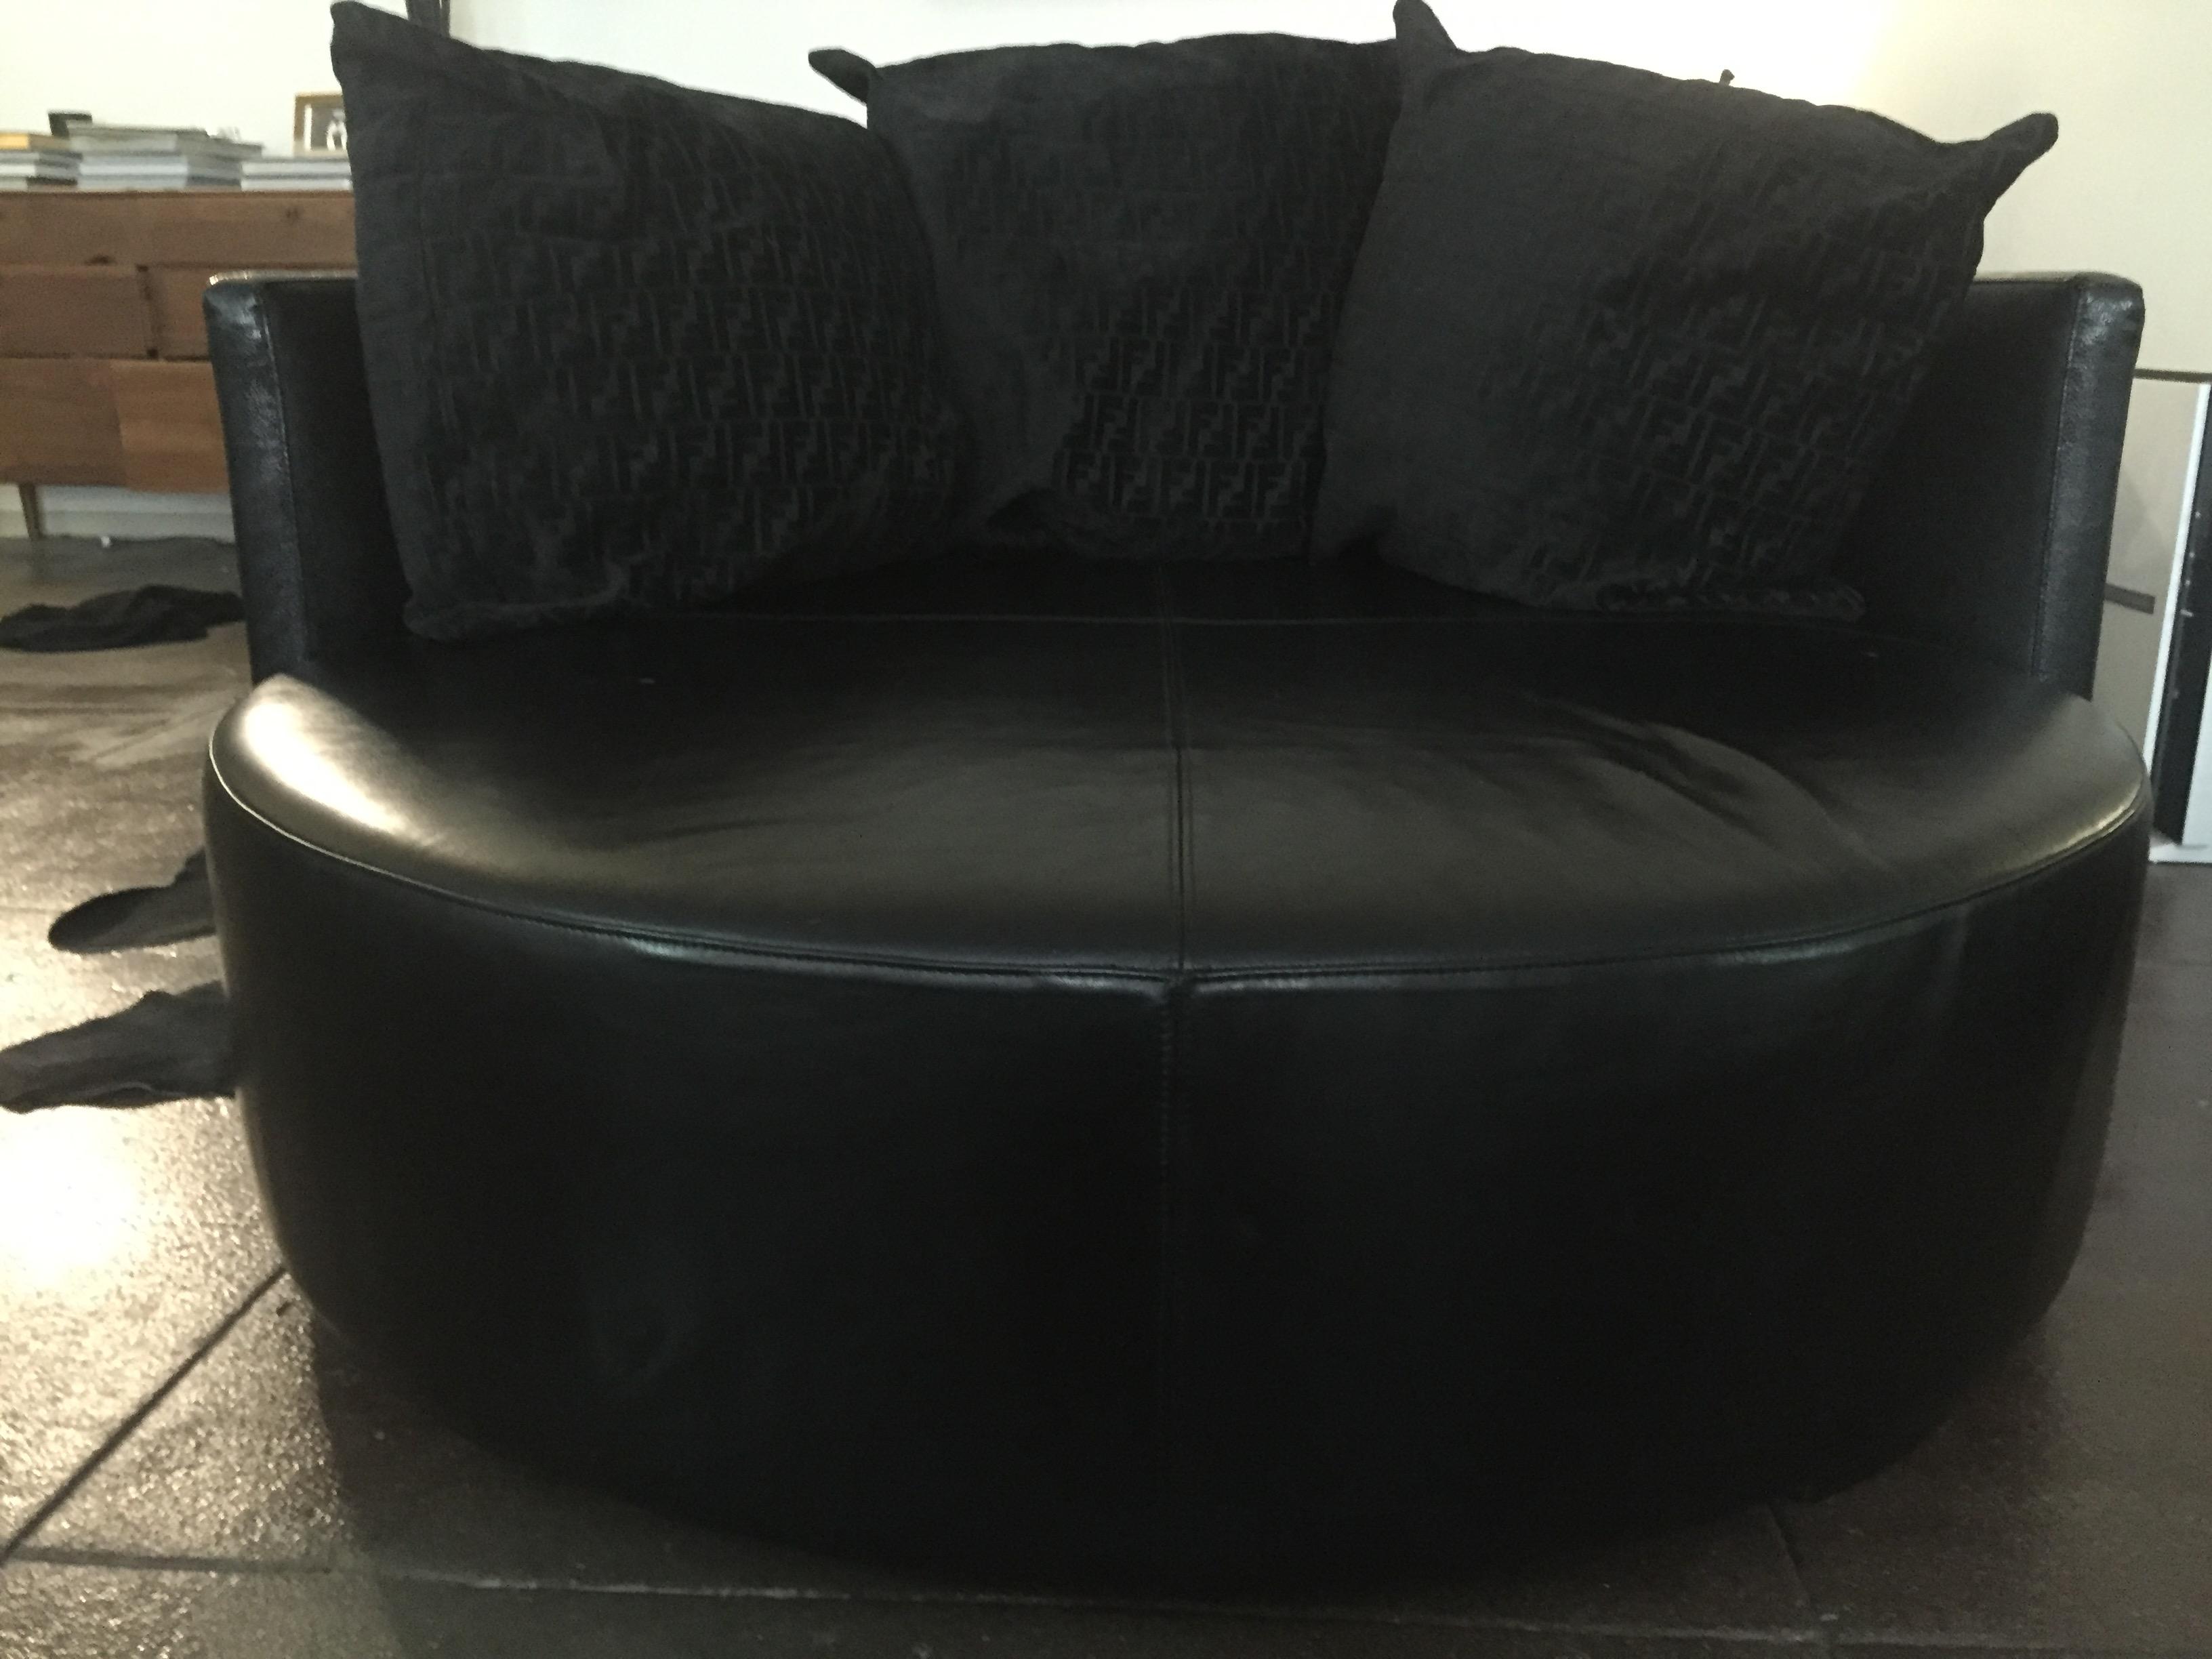 Delightful Fendi Casa Black Stingray Leather Circular Sofa